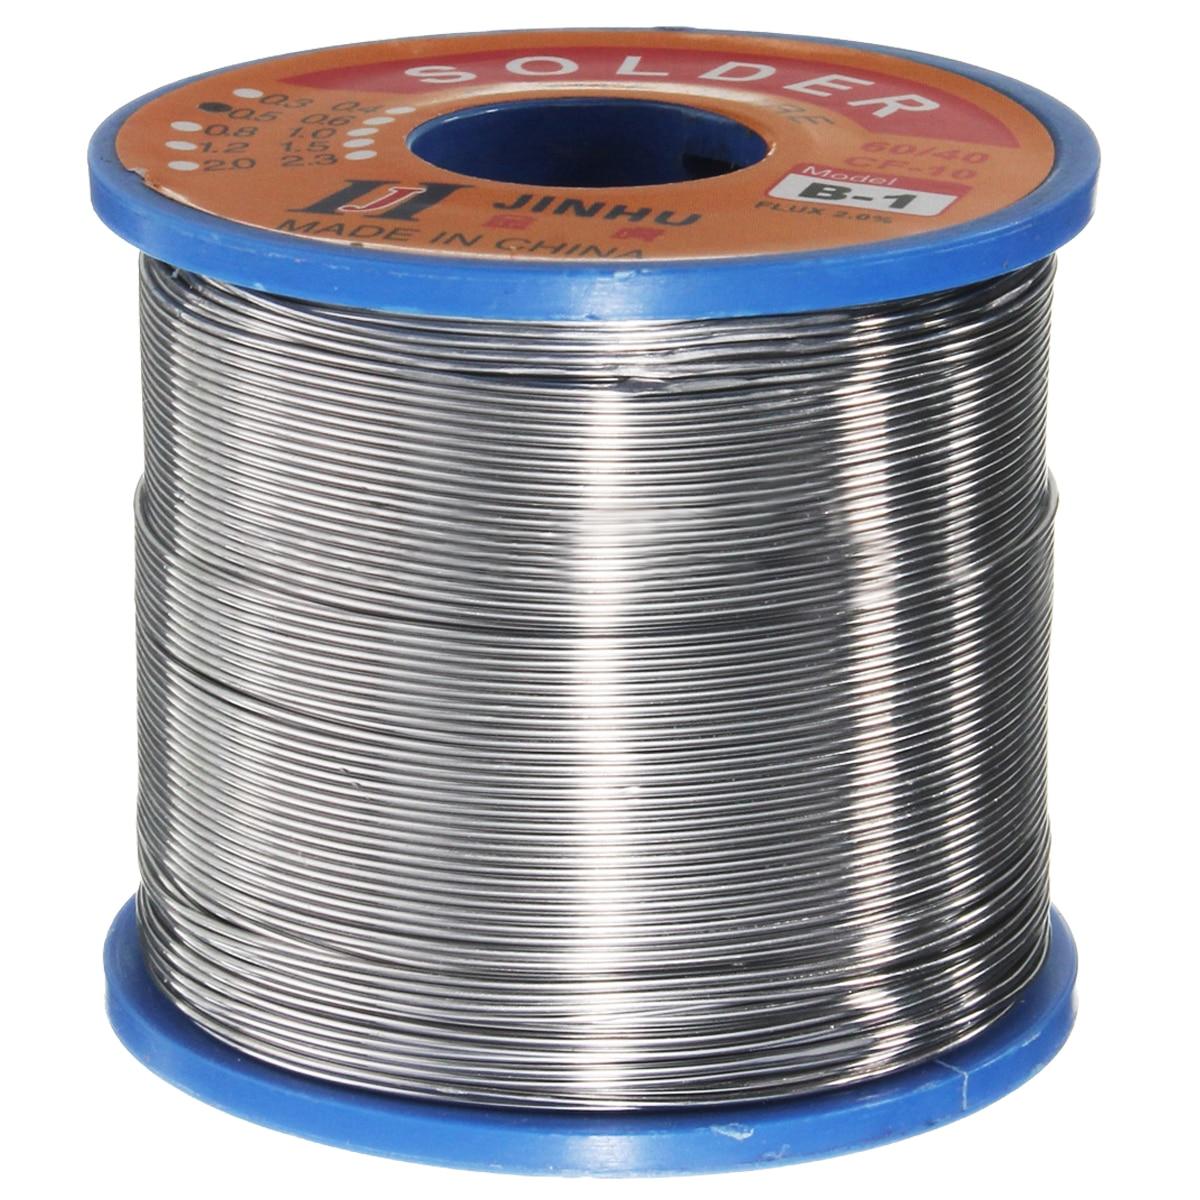 400g 60/40 Tin Lead Solder Flux Wire Rosin Core Soldering Roll 0.6-1.2mm